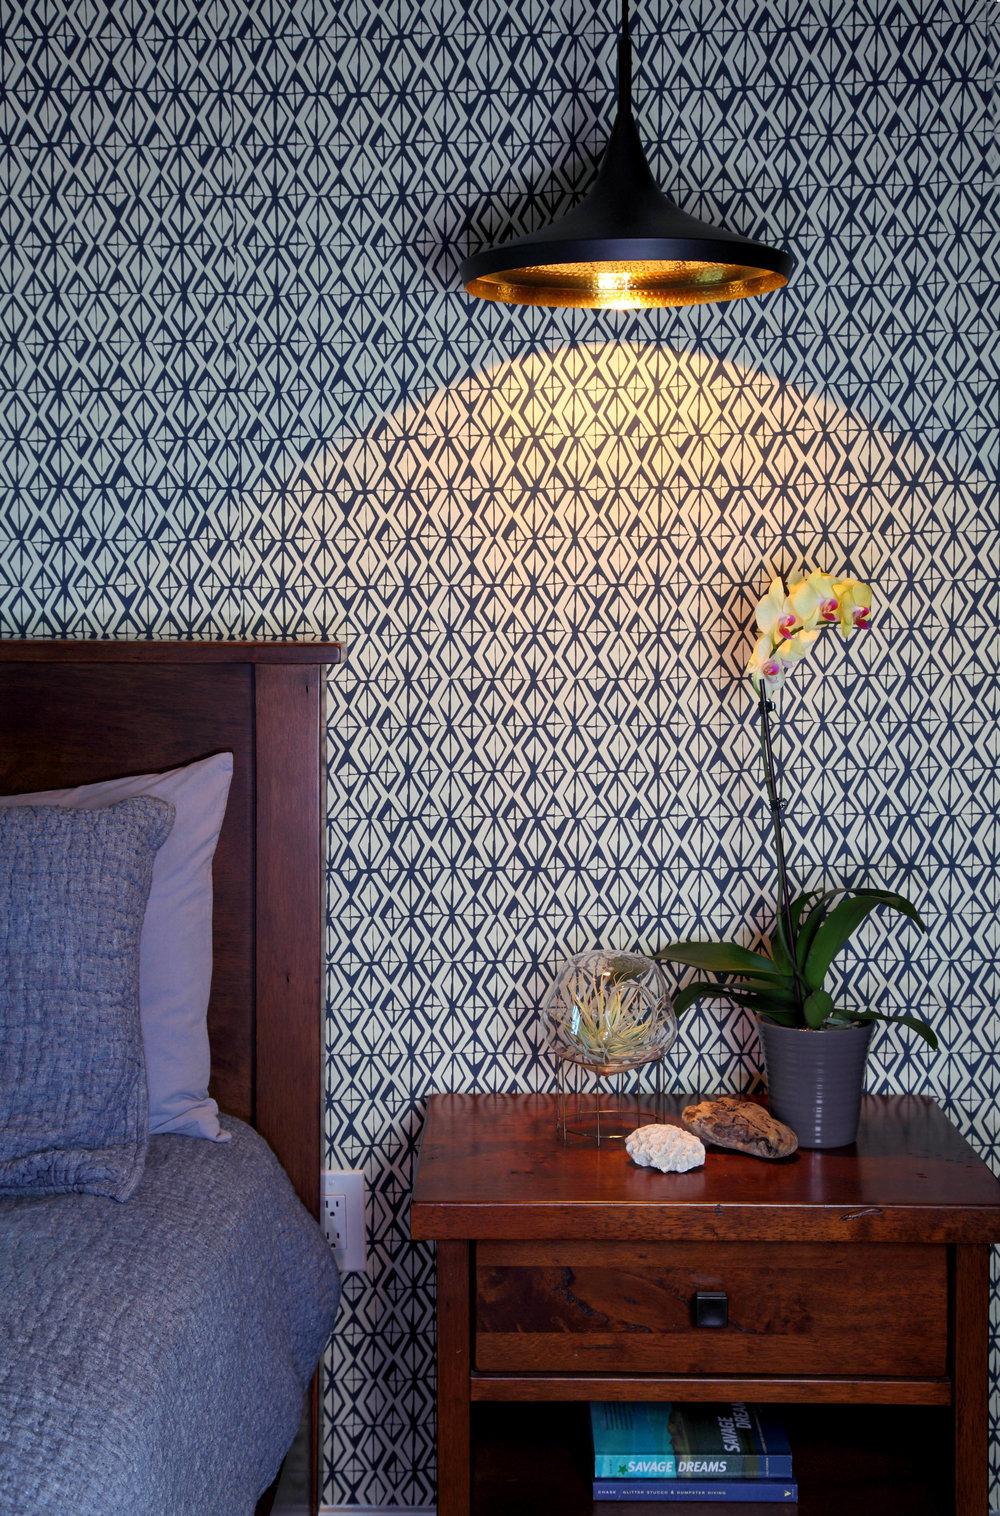 Sarah-barnard-design-modern-bachelorpad-wallpaper-detail.jpg